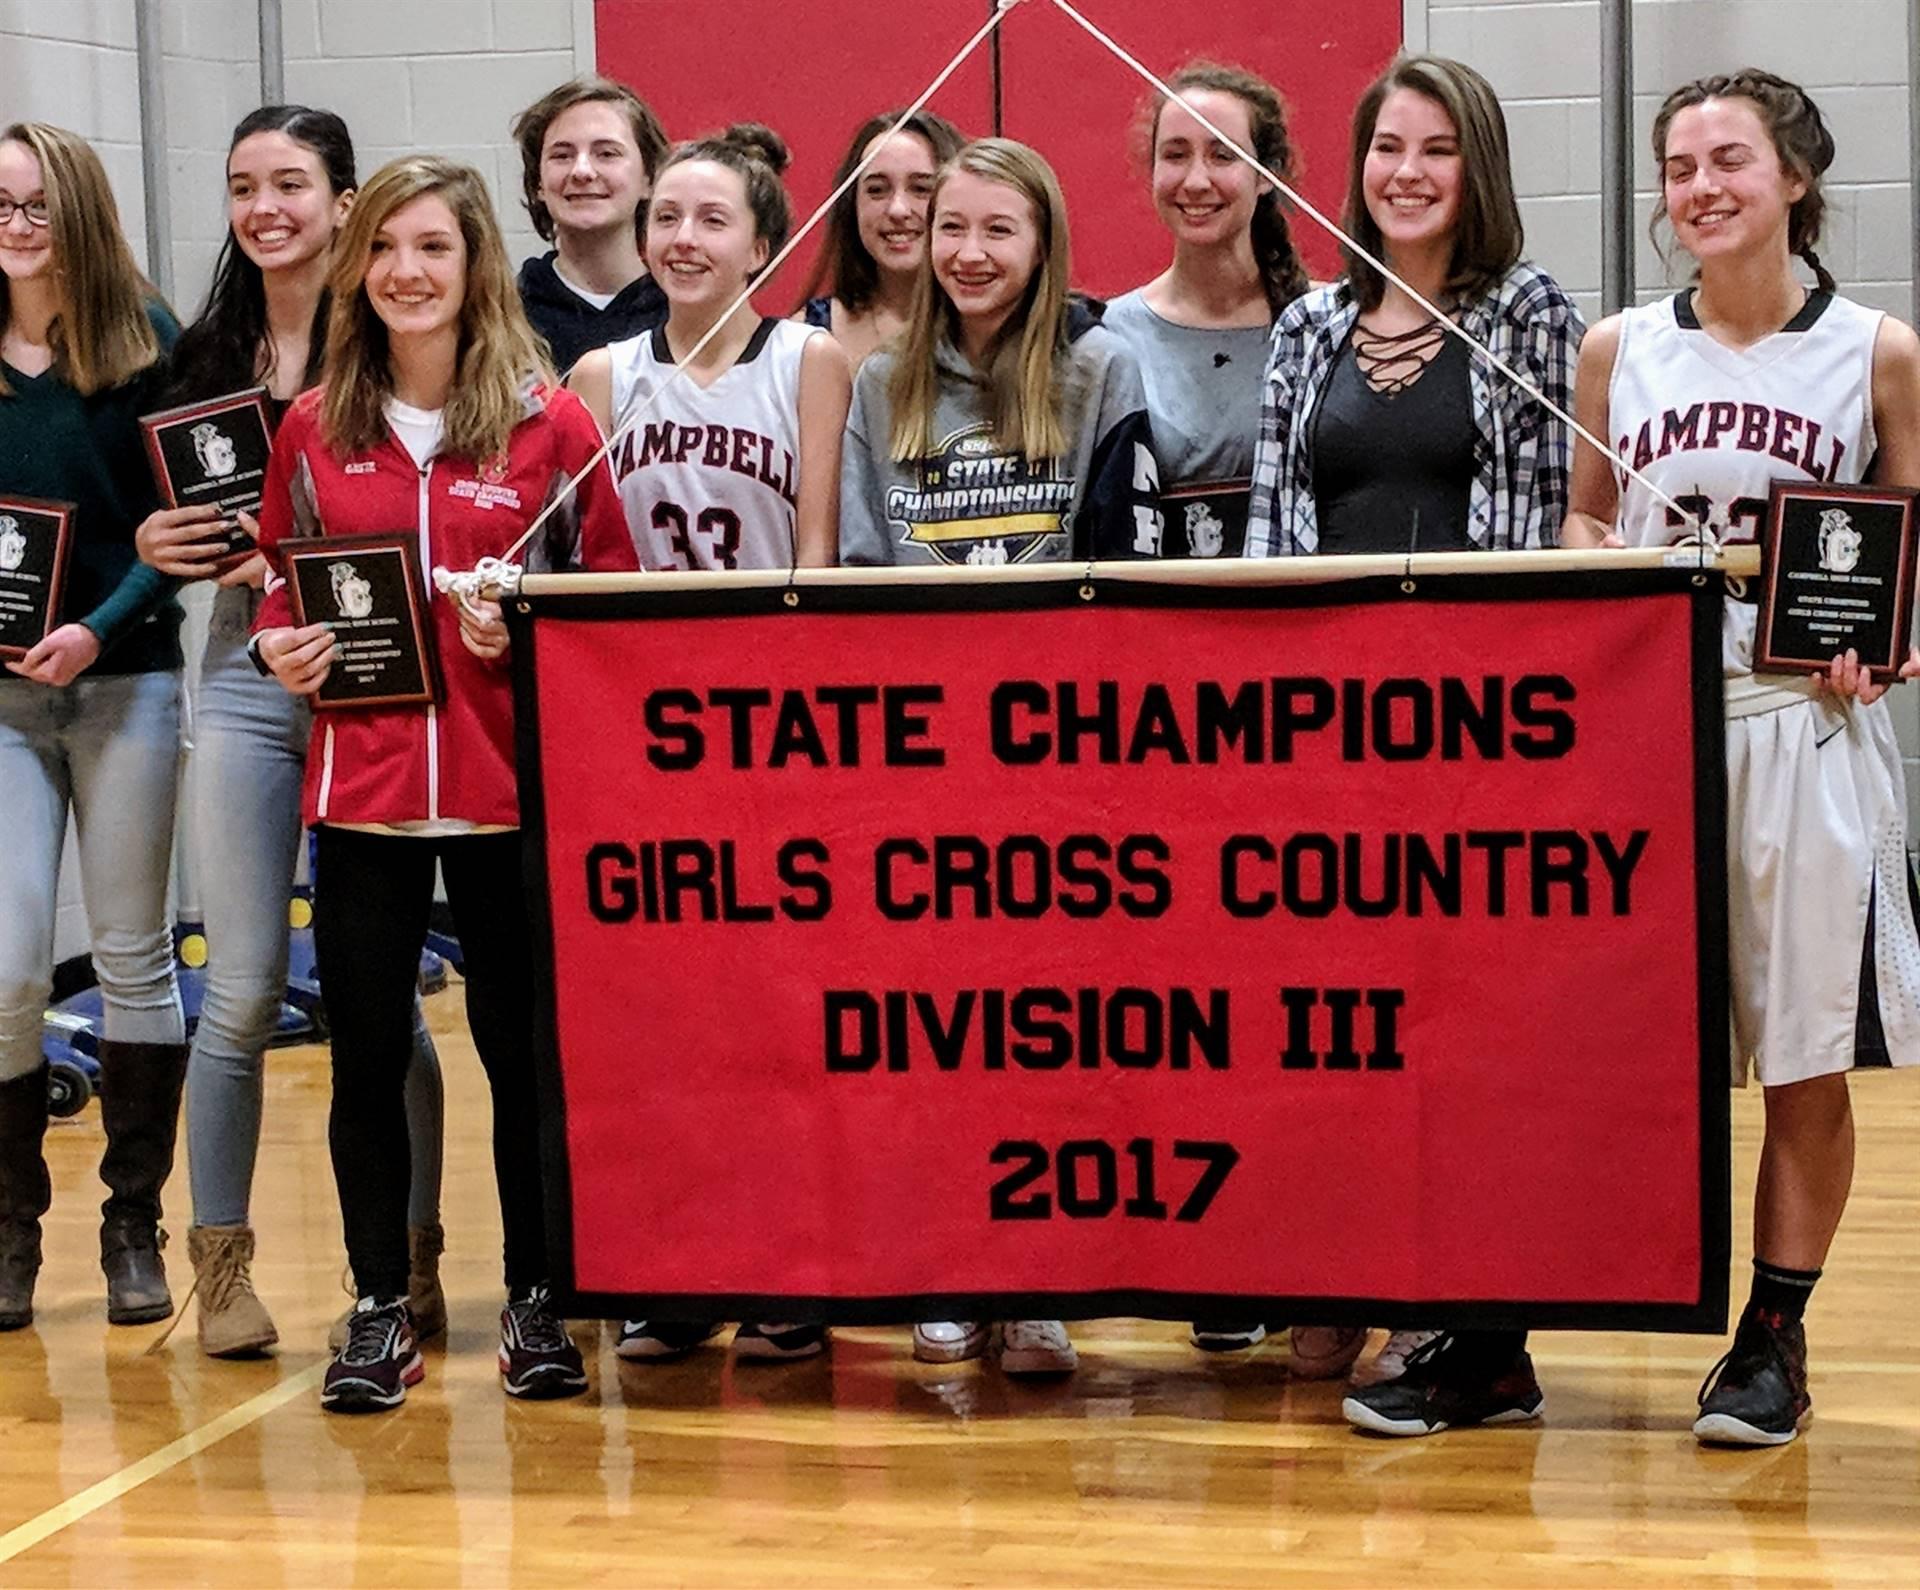 Raising the Girls Cross Country 2017 State Champion banner